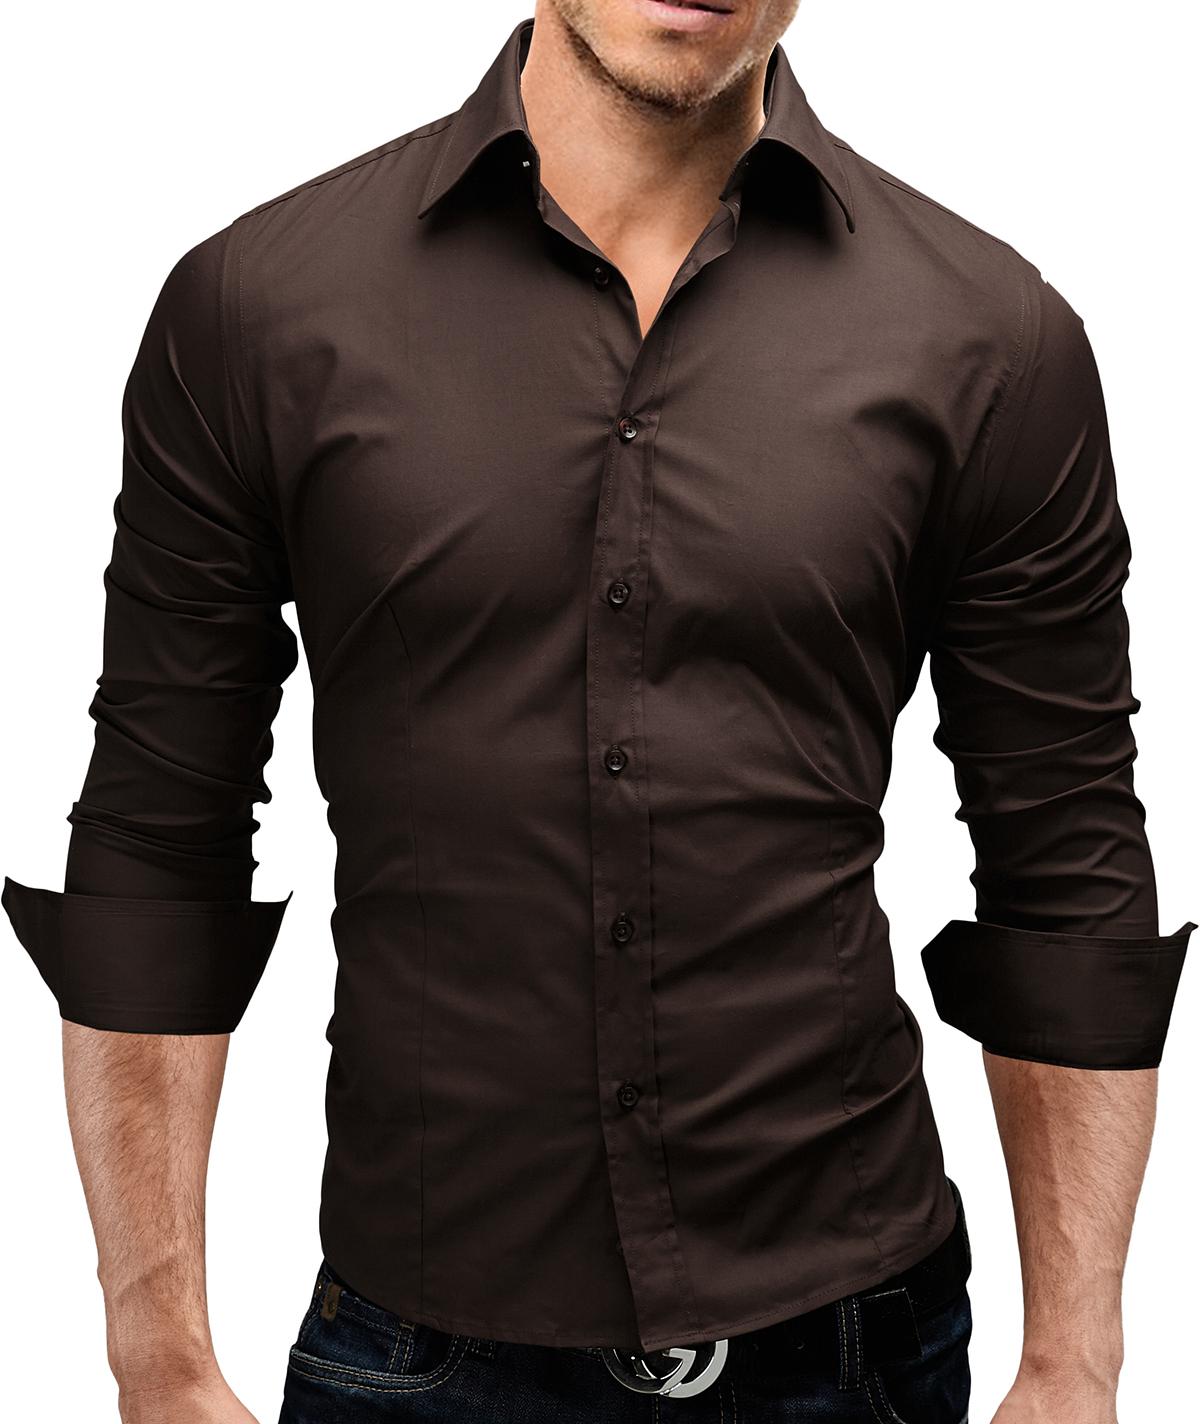 MERISH Herren Hemd 6 MODELLE S-XXL Slim Fit Neu T-Shirt Polo Style Hemd WOW